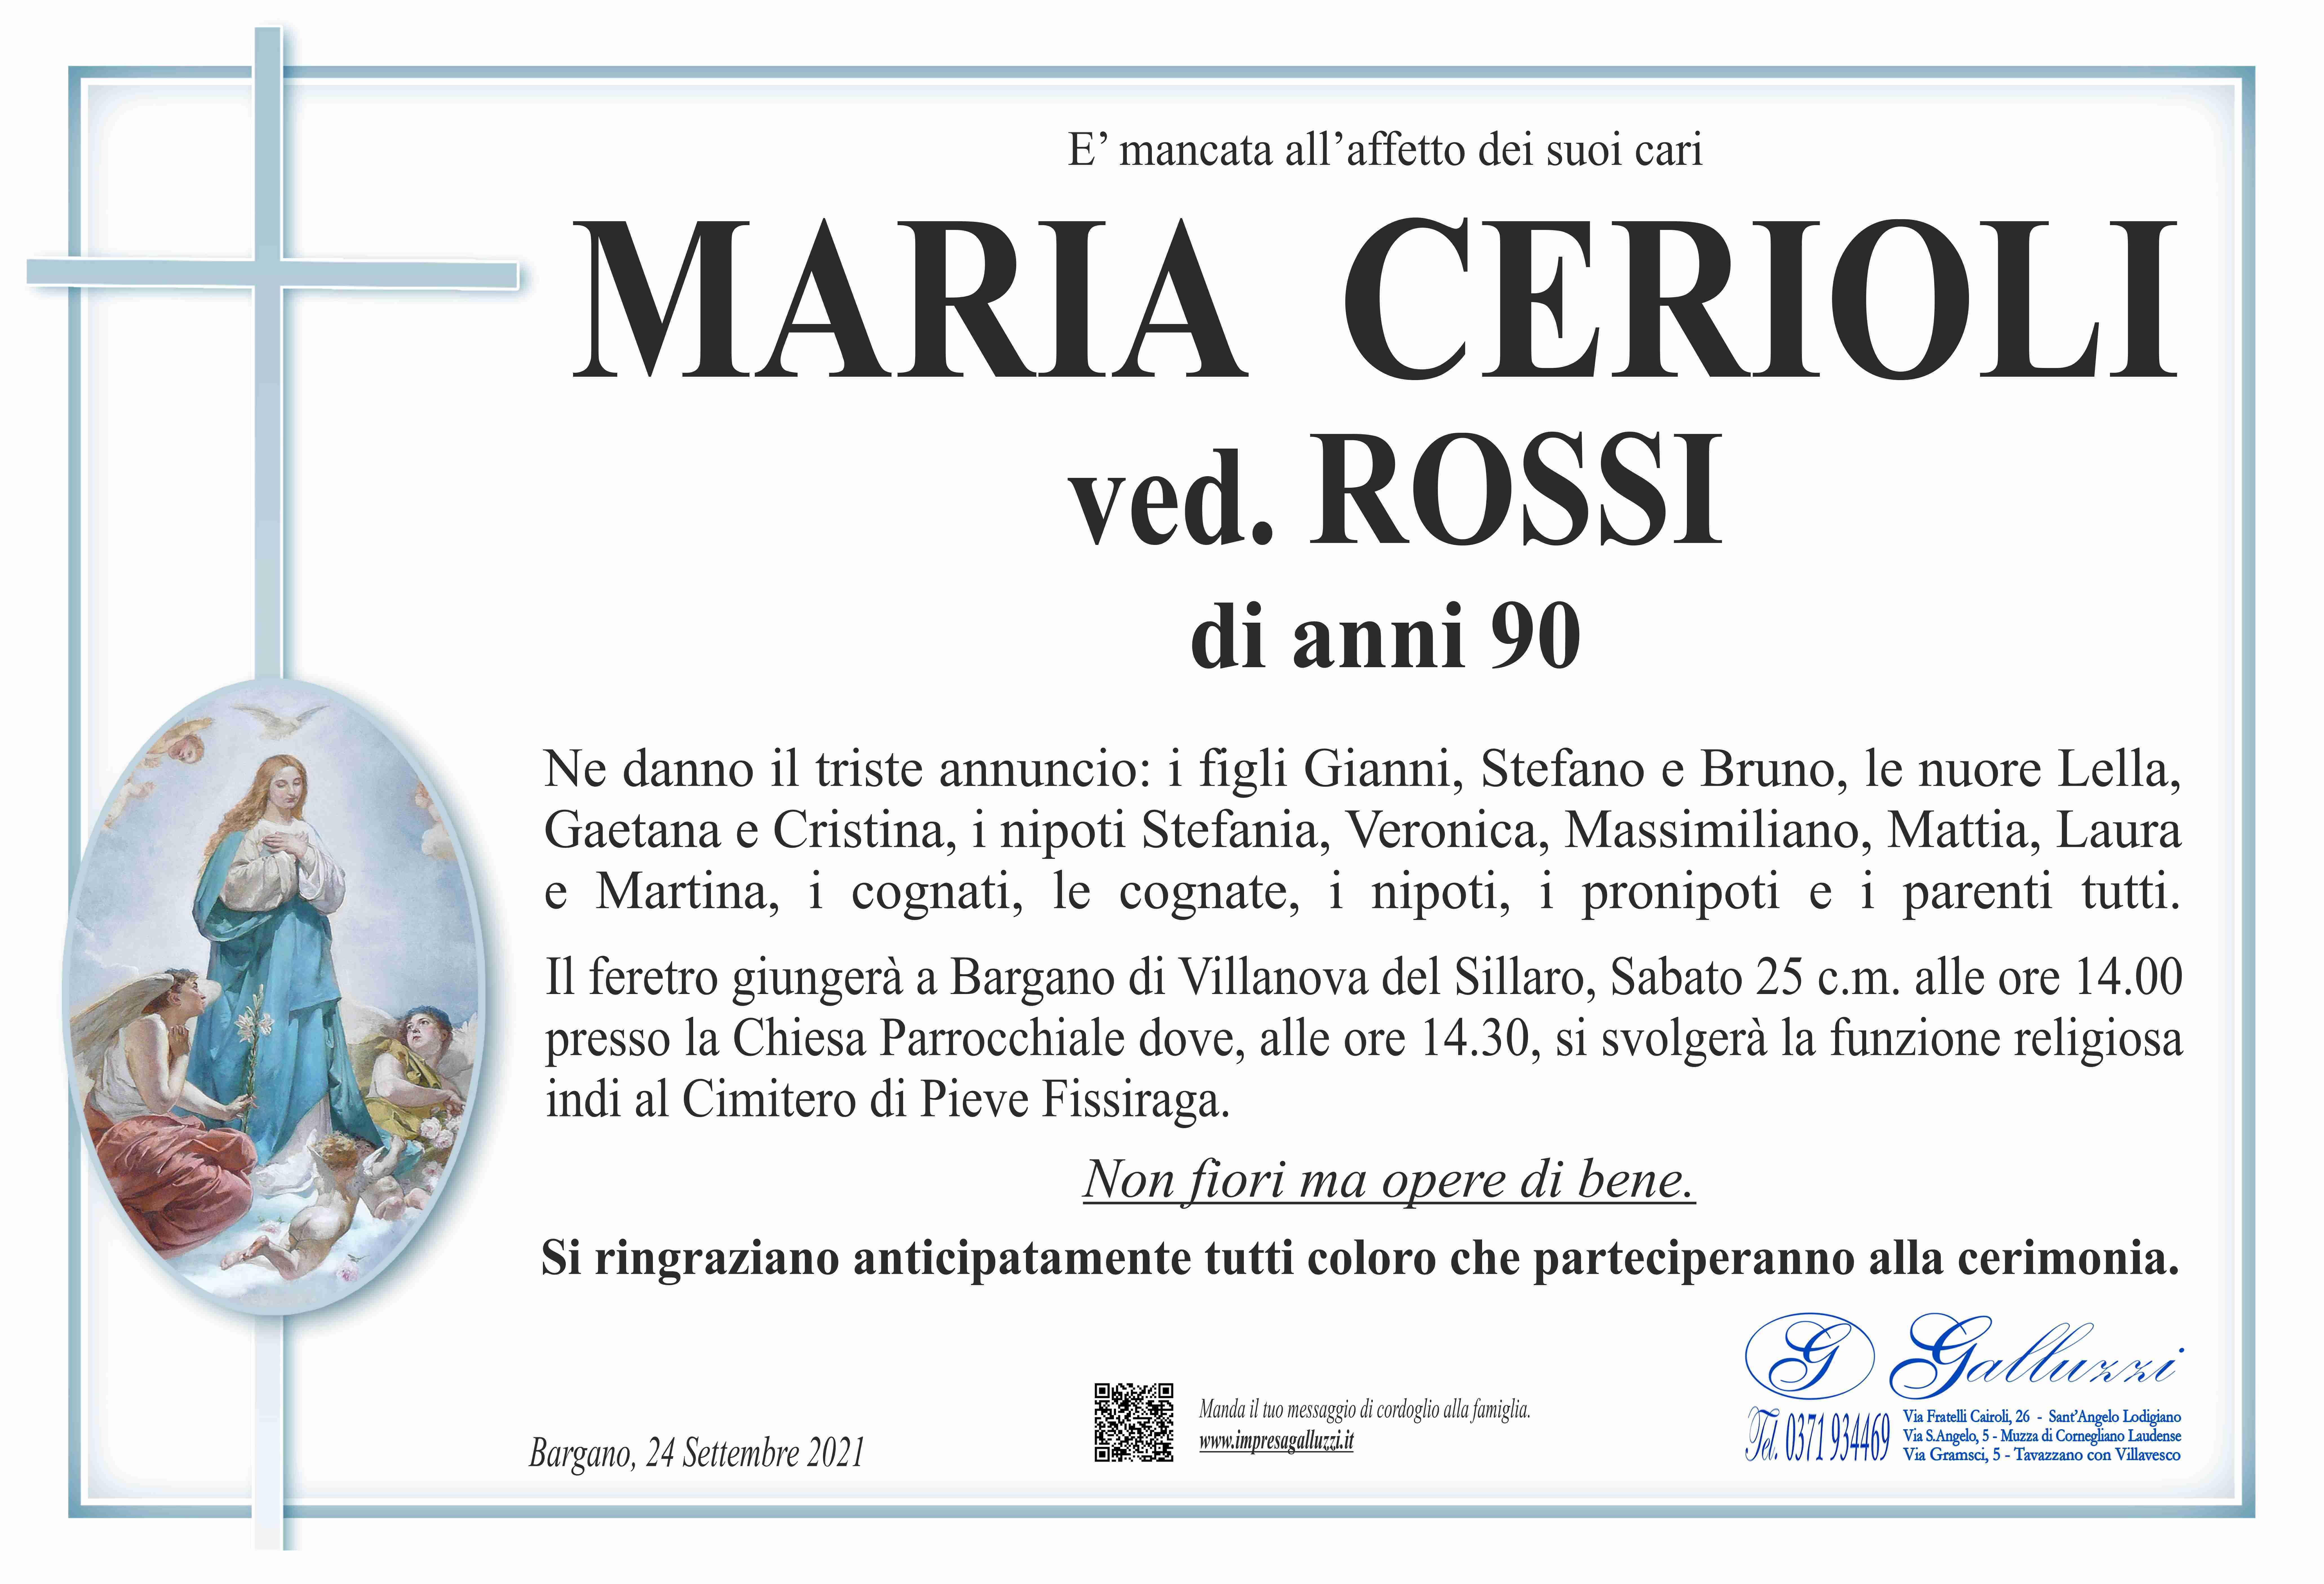 Maria Cerioli